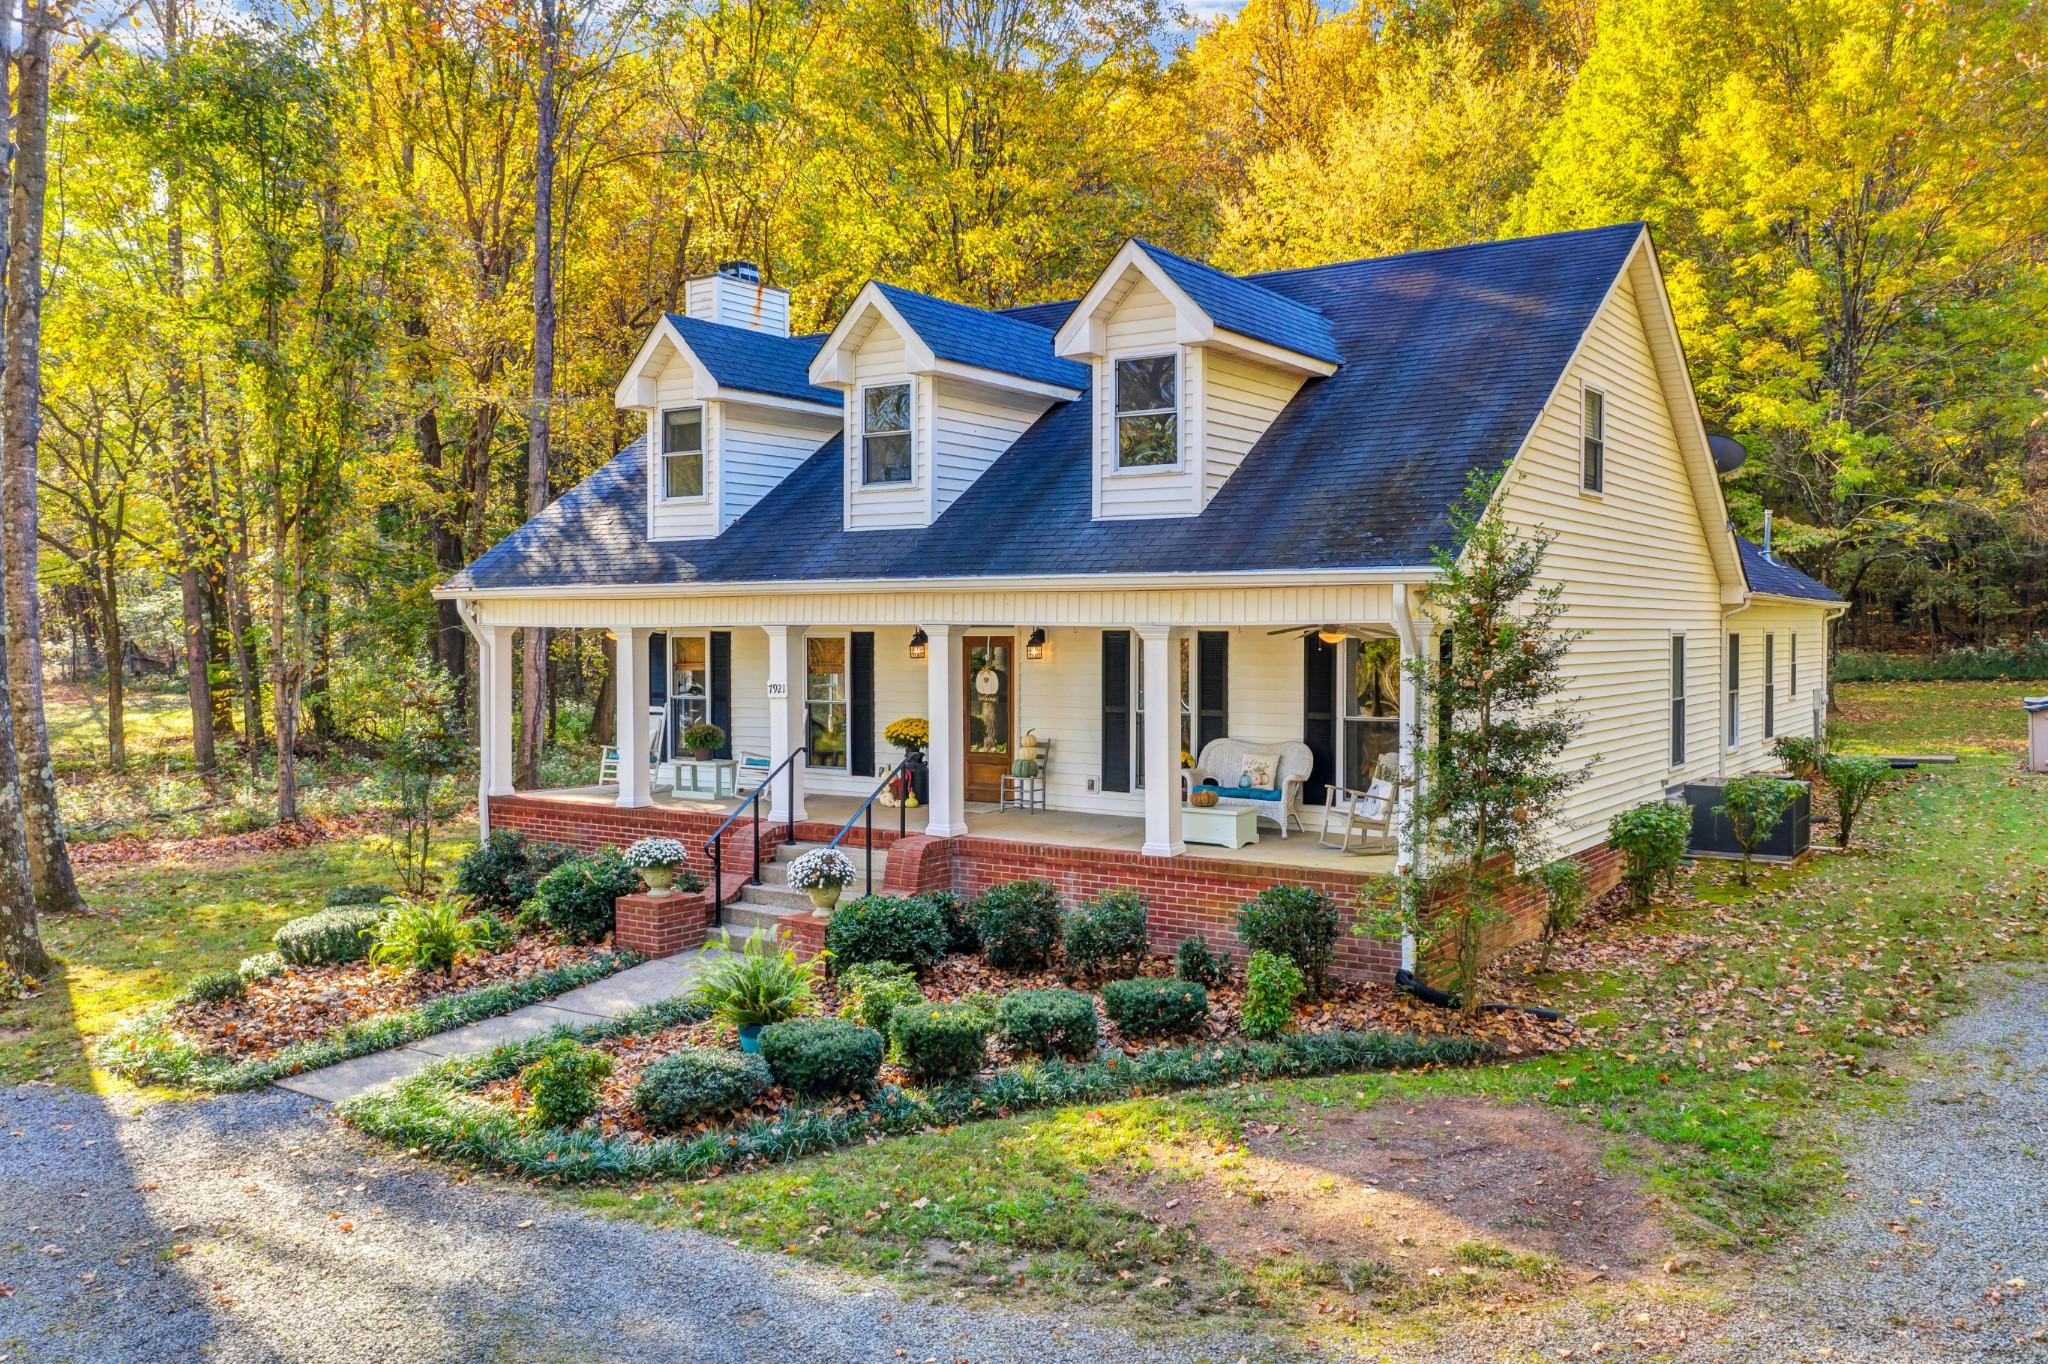 7921 Highway 25 E Property Photo - Cross Plains, TN real estate listing